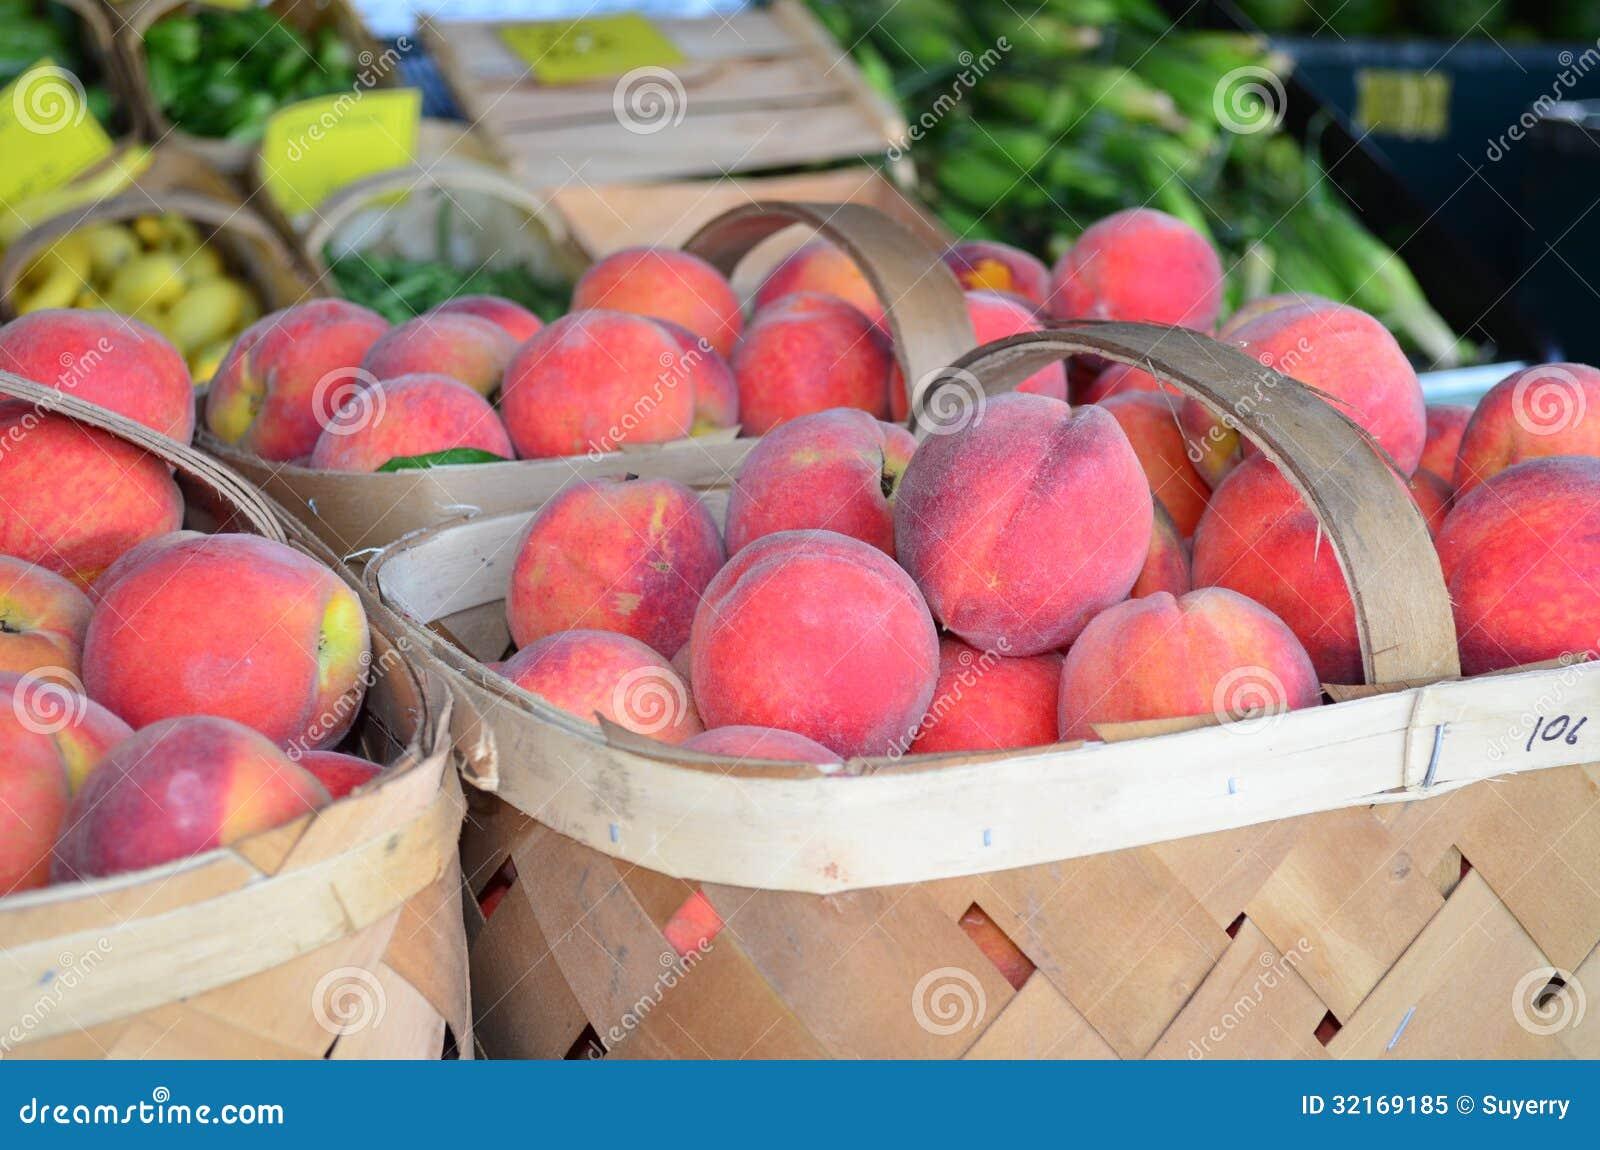 Baskets of Peaches Closeup